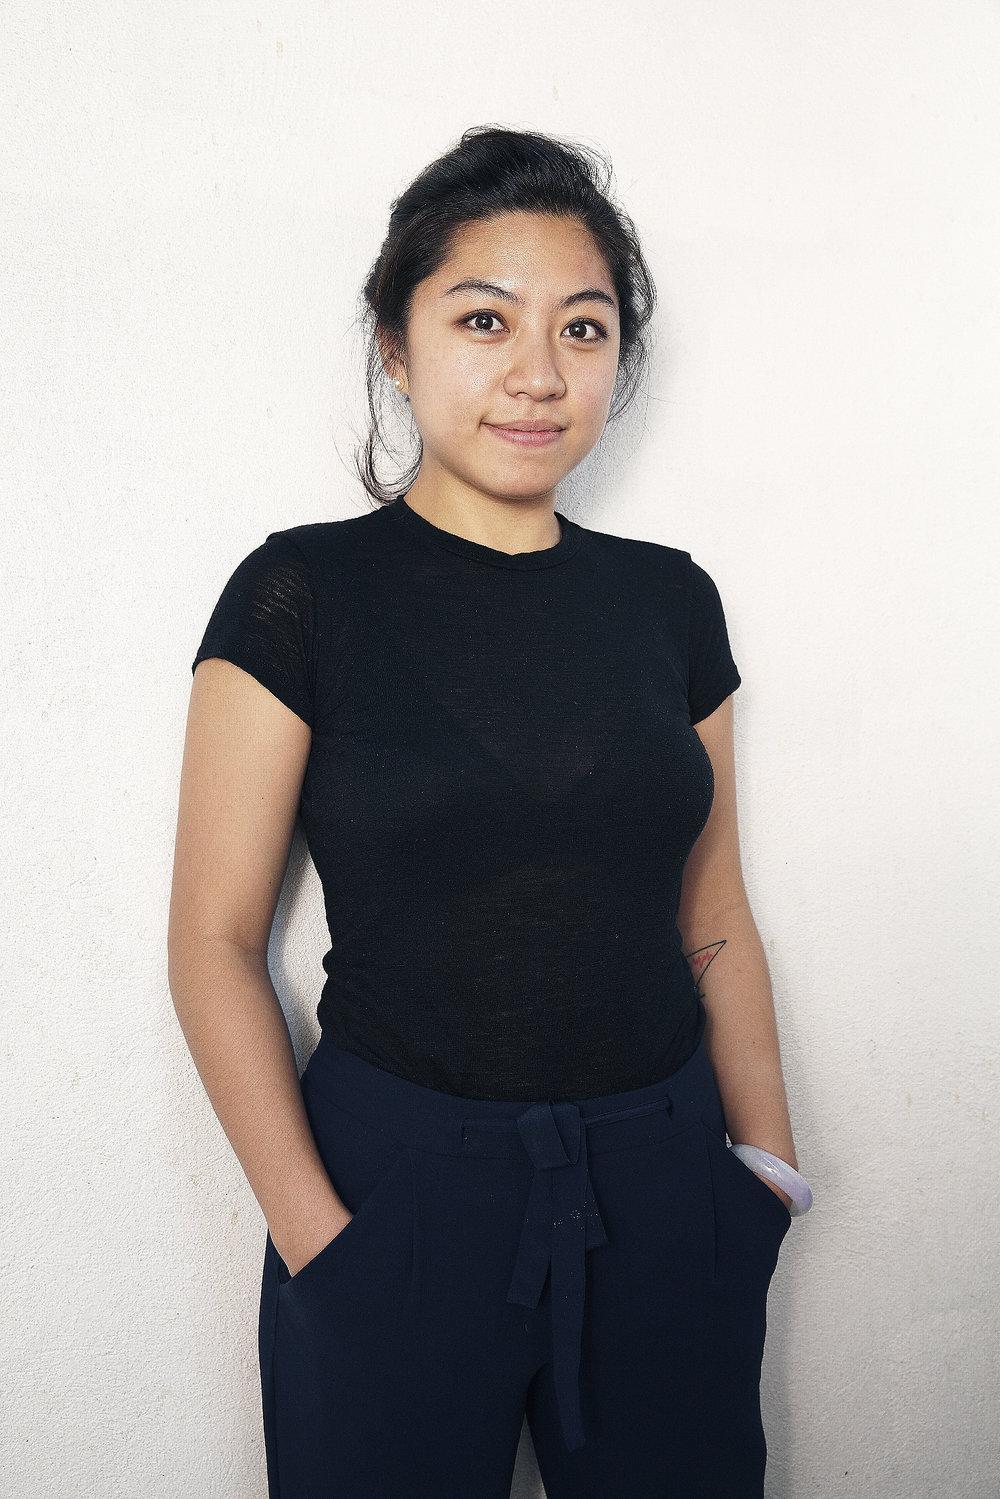 Amelie Kang